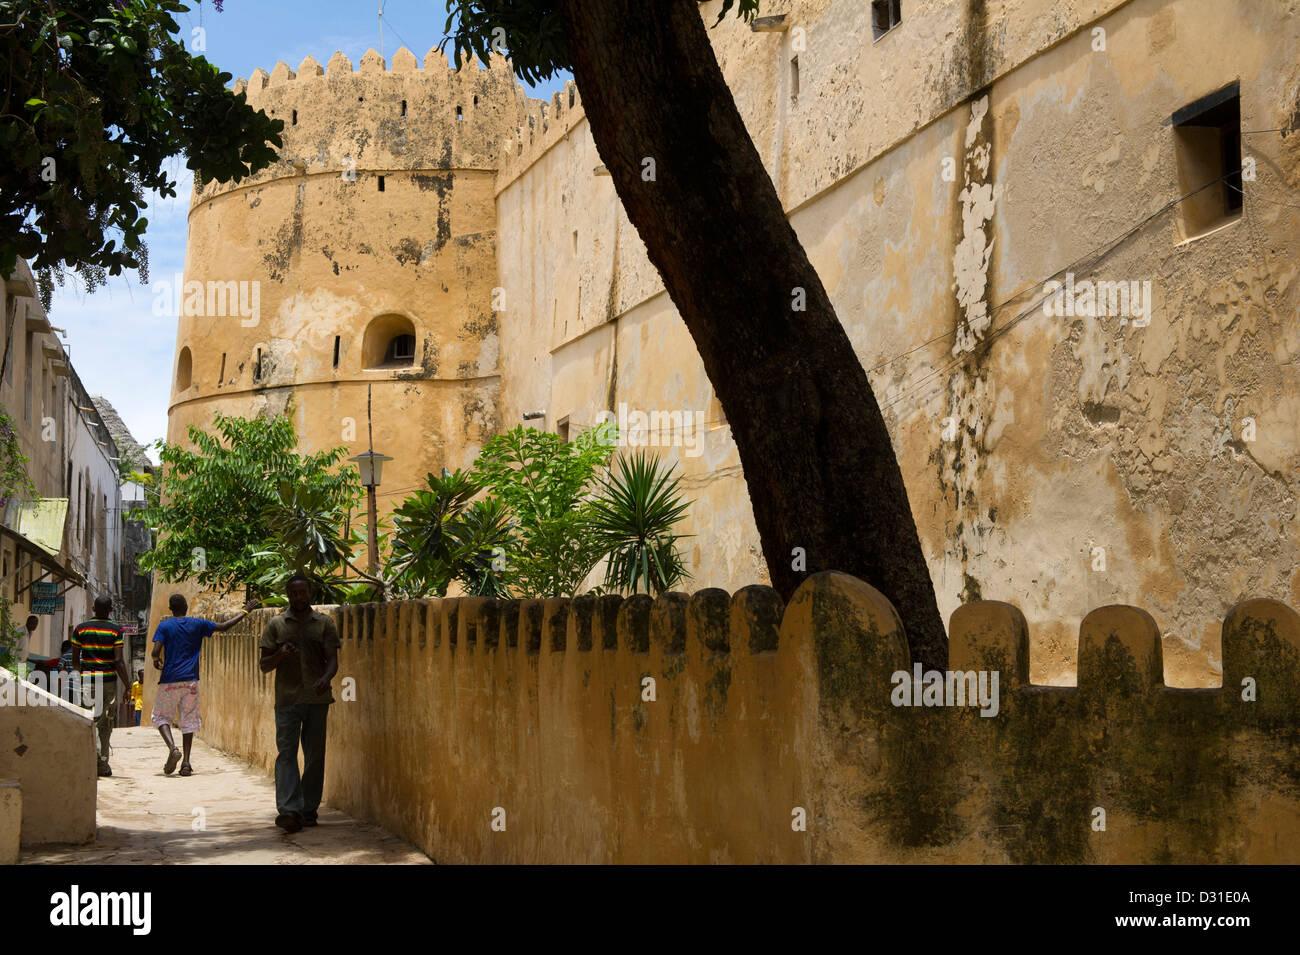 The Fort, Lamu, Lamu Archipelago, Kenya Stock Photo